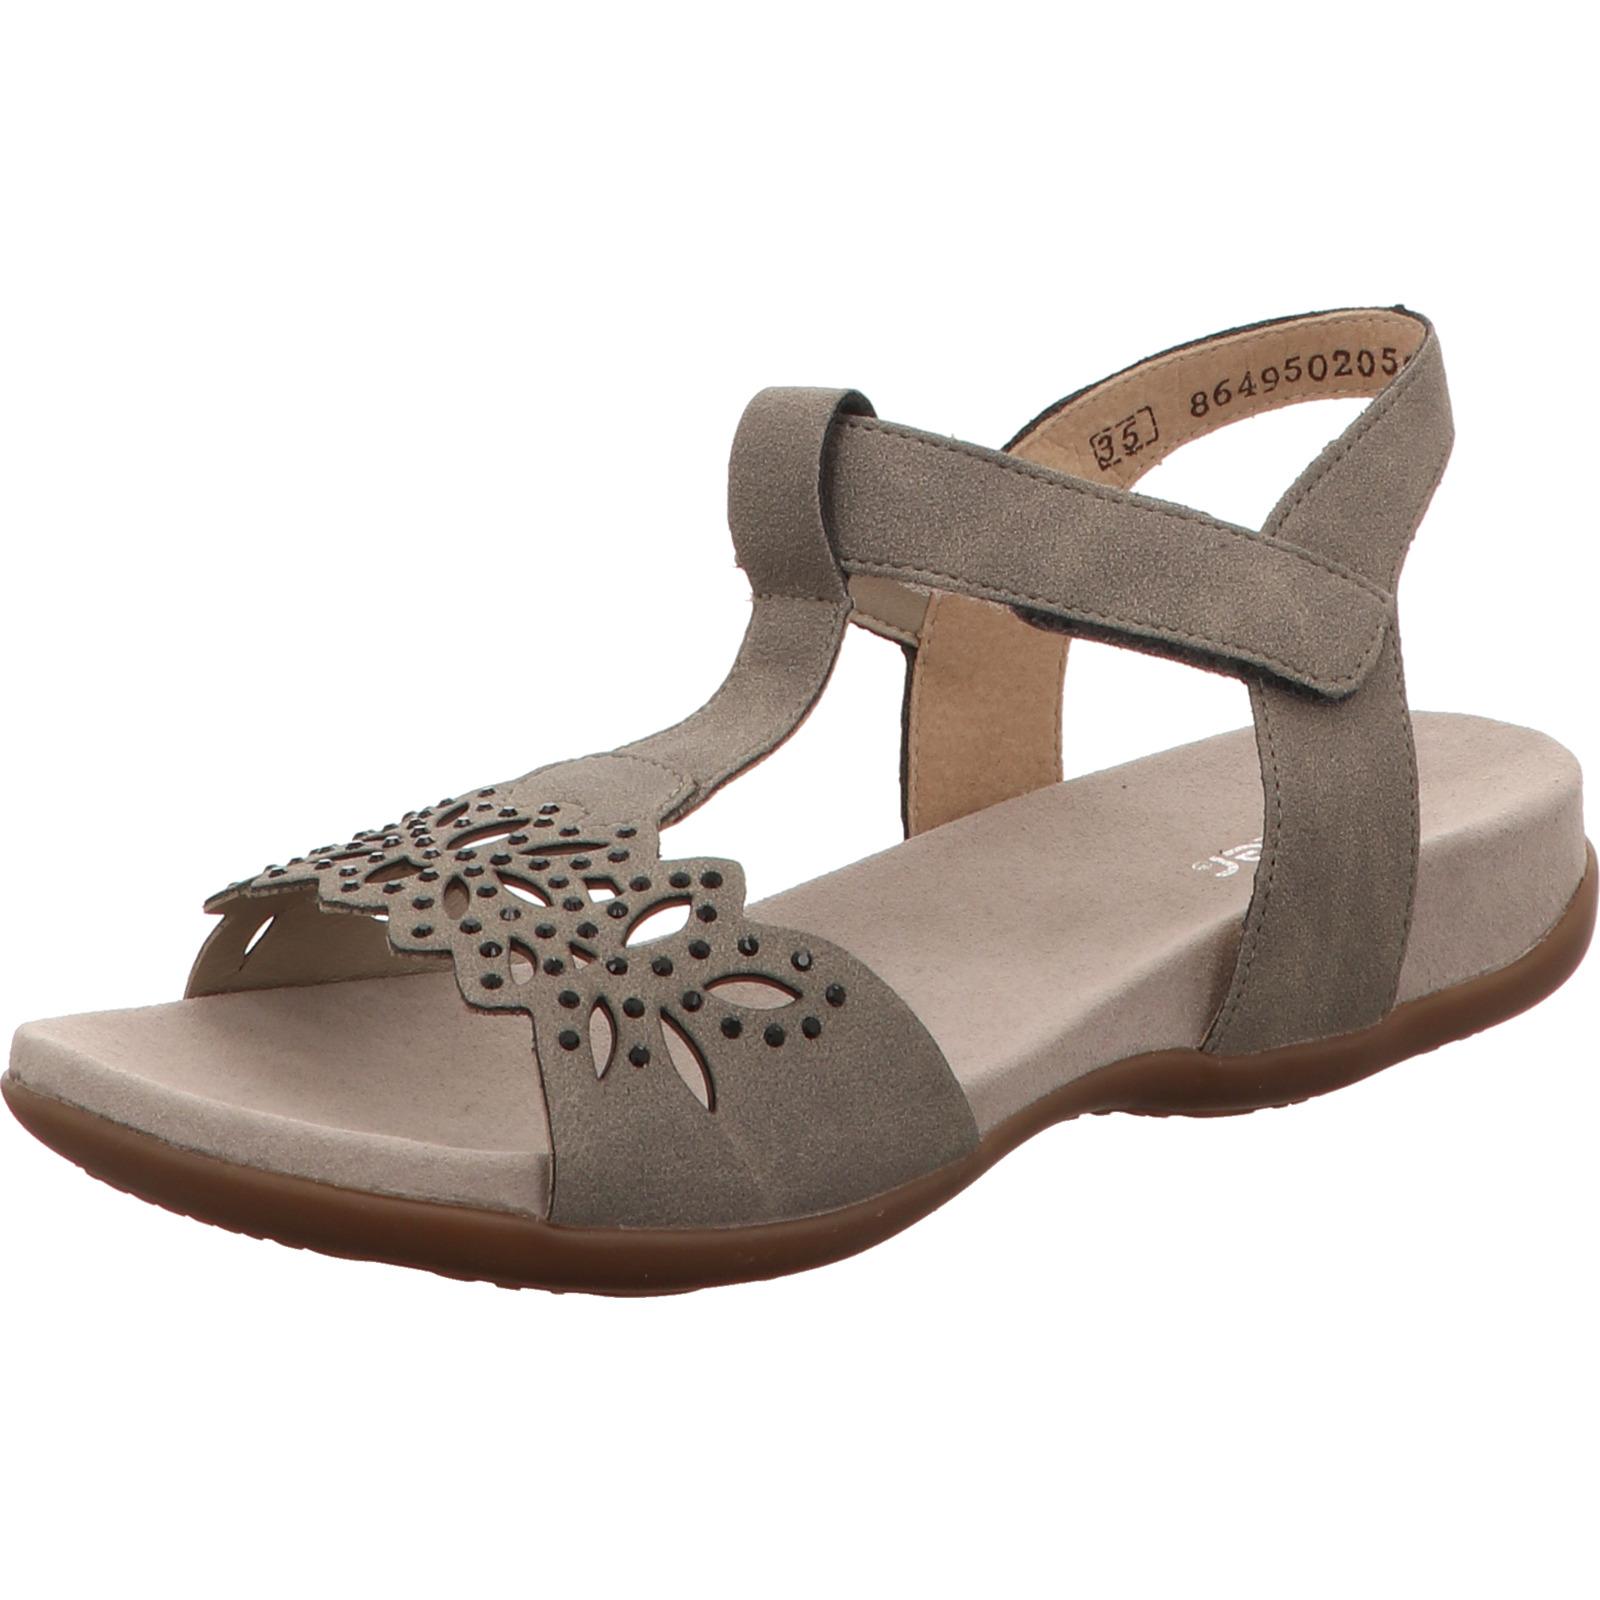 Rieker Mädchen Sandalette grau